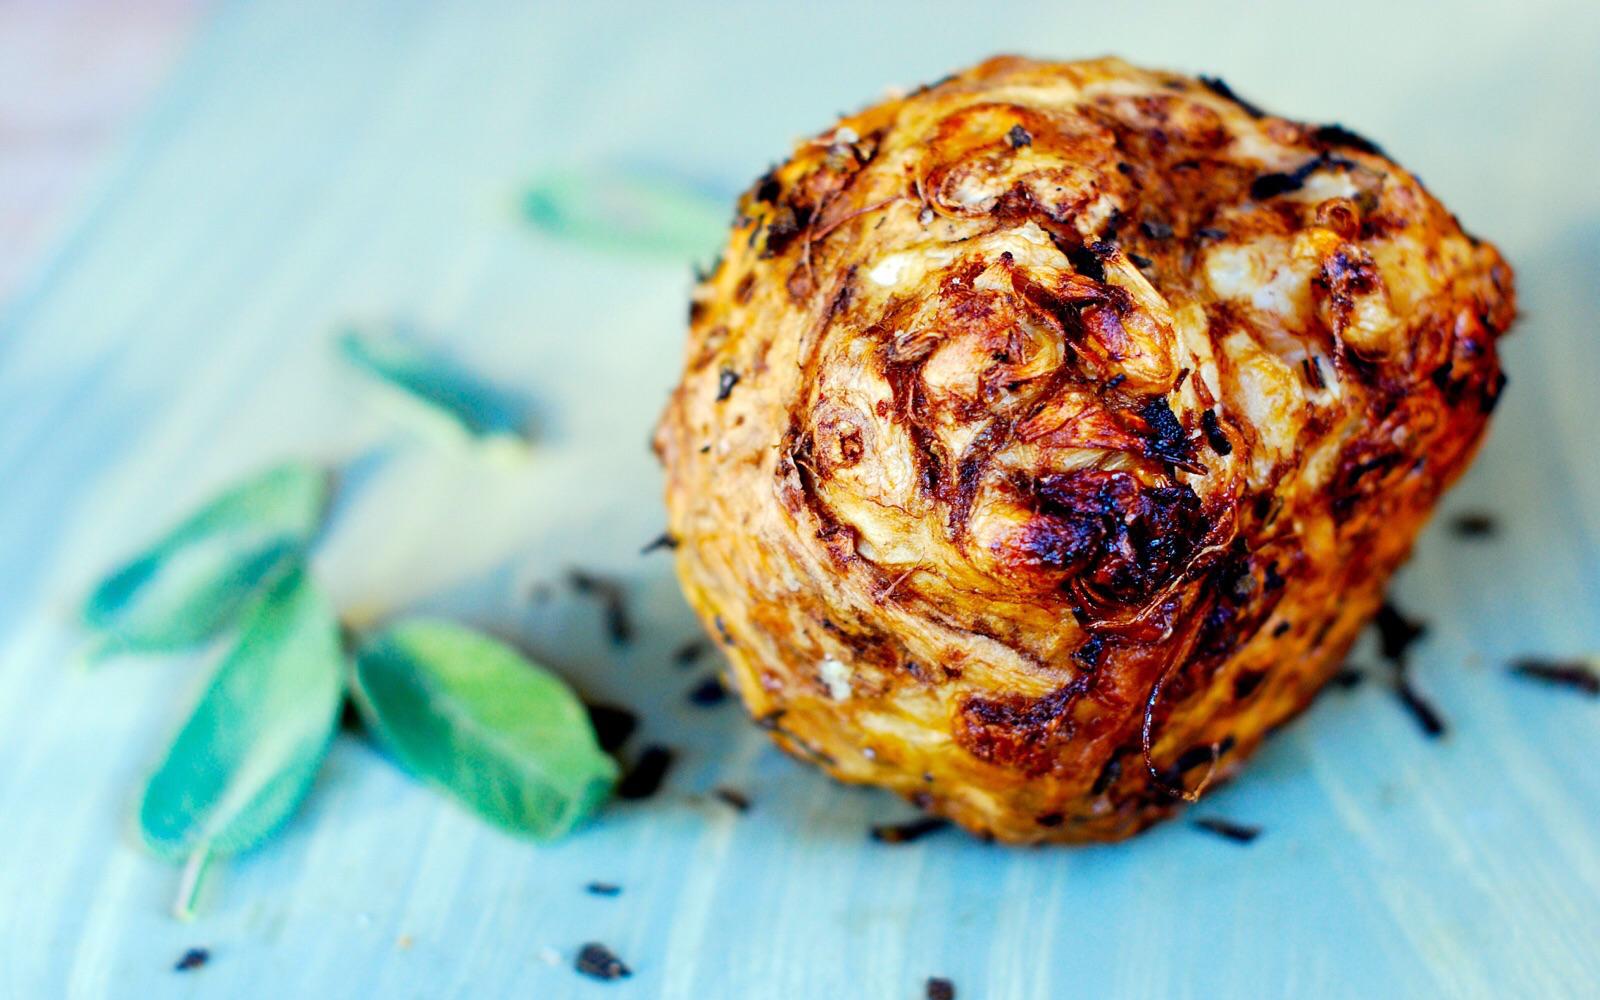 Vegan Whole Roasted Celeriac With Herbs, Olive Oil, and Sea Salt